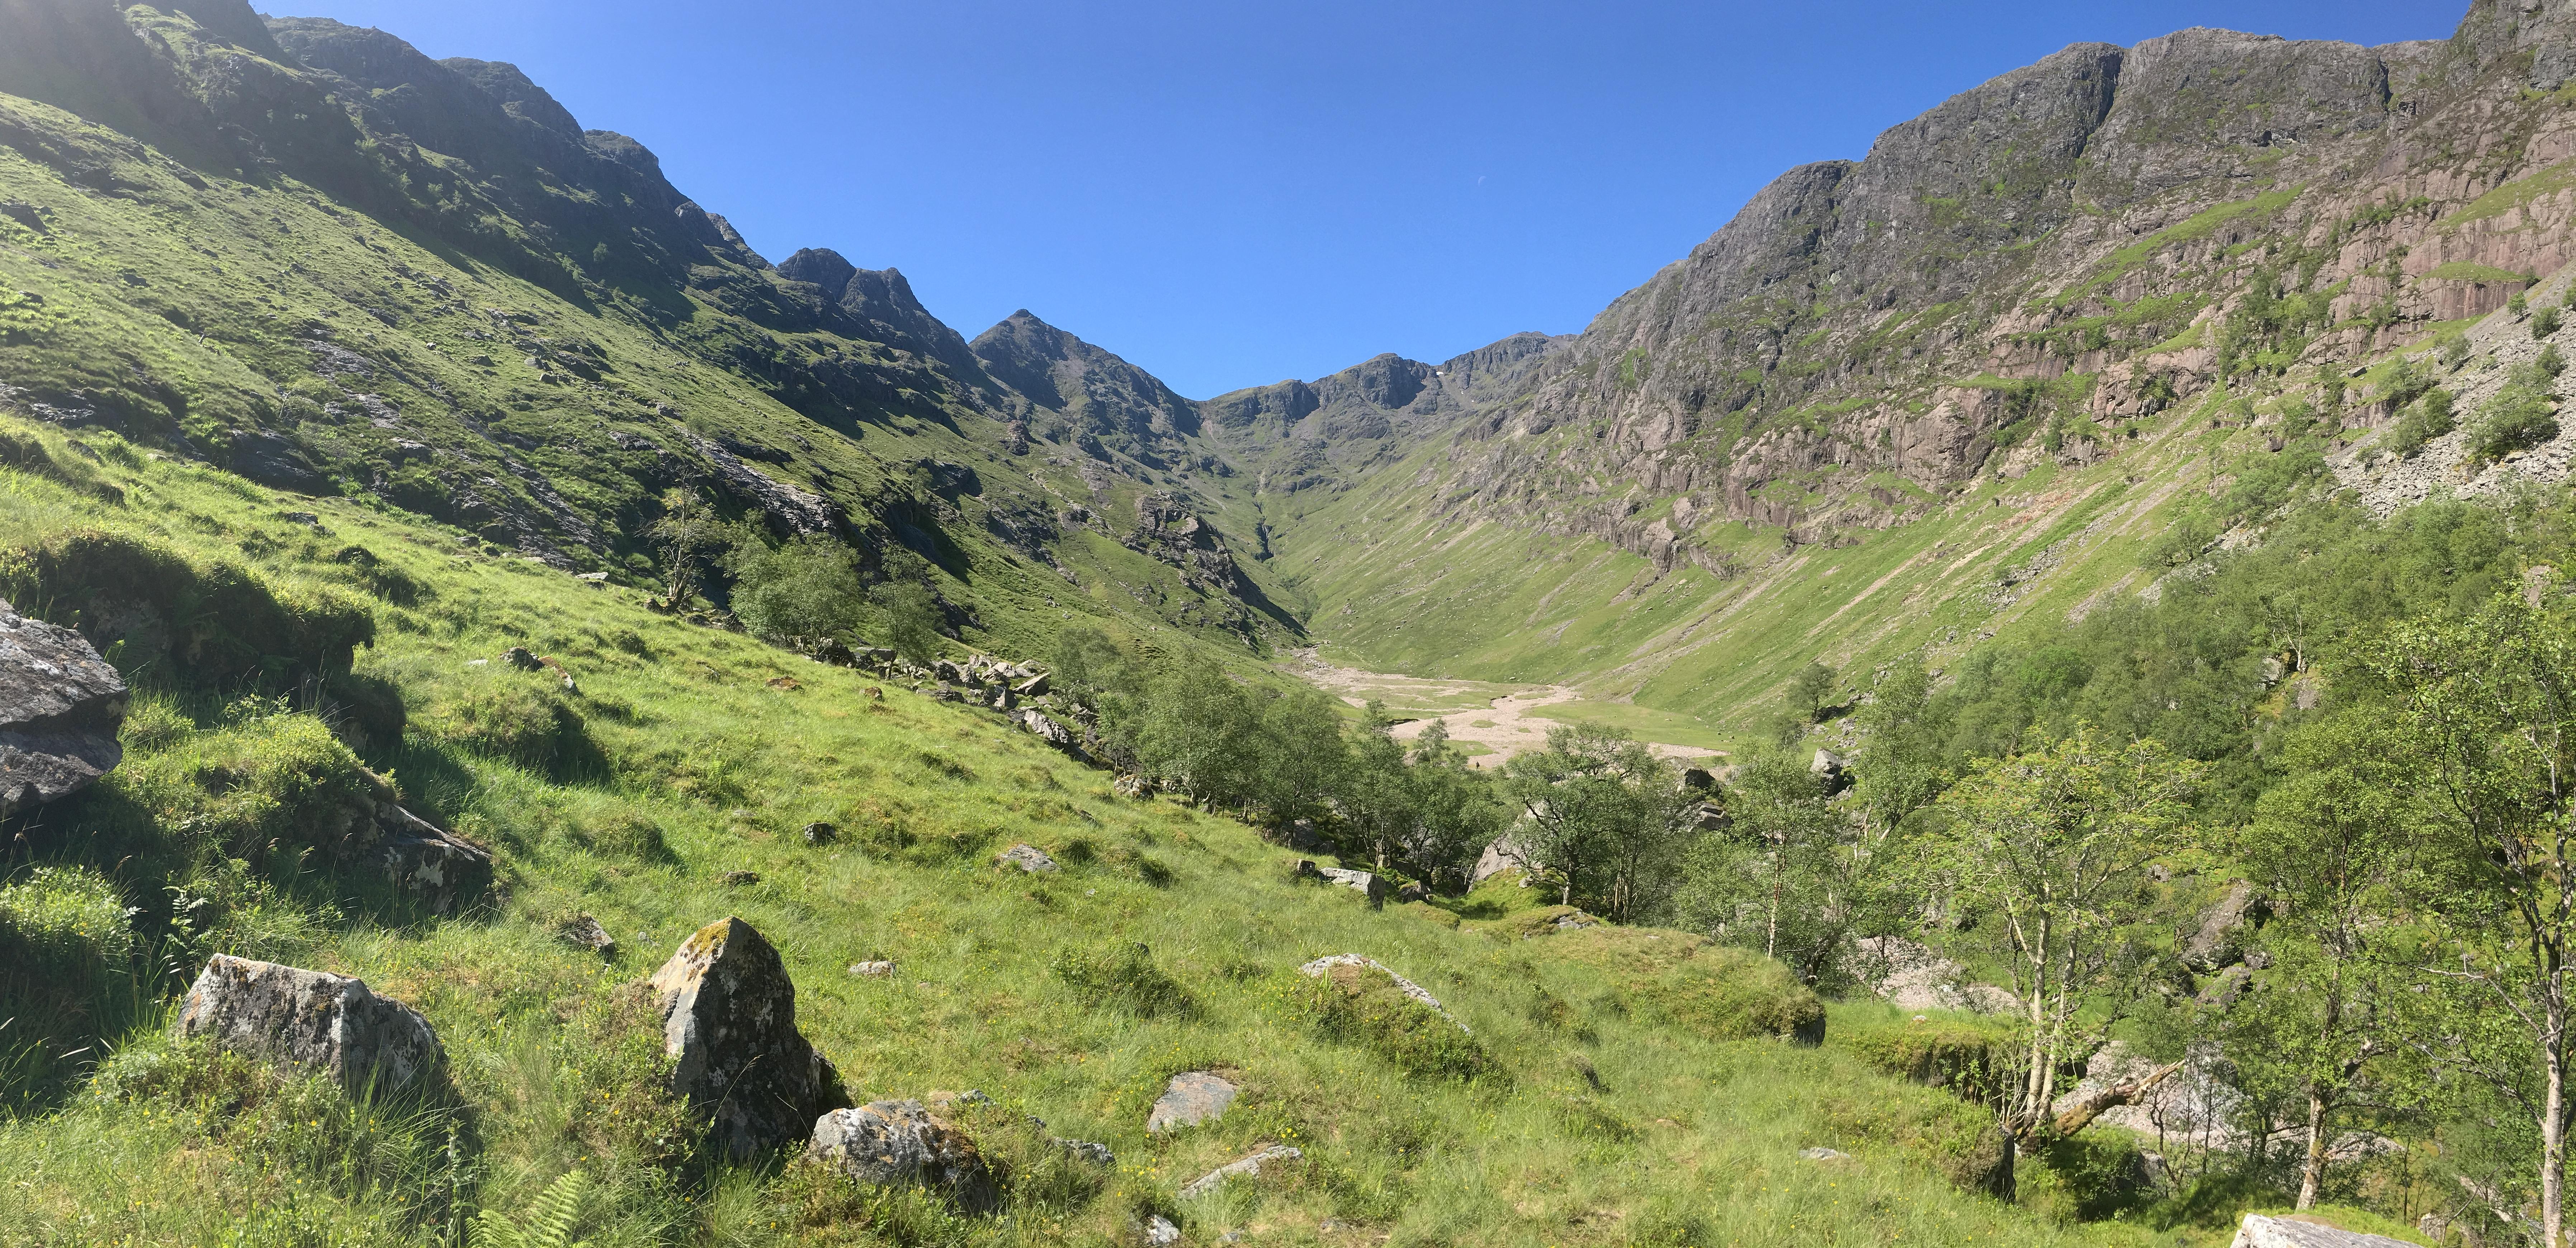 Lost Valley - Glencoe